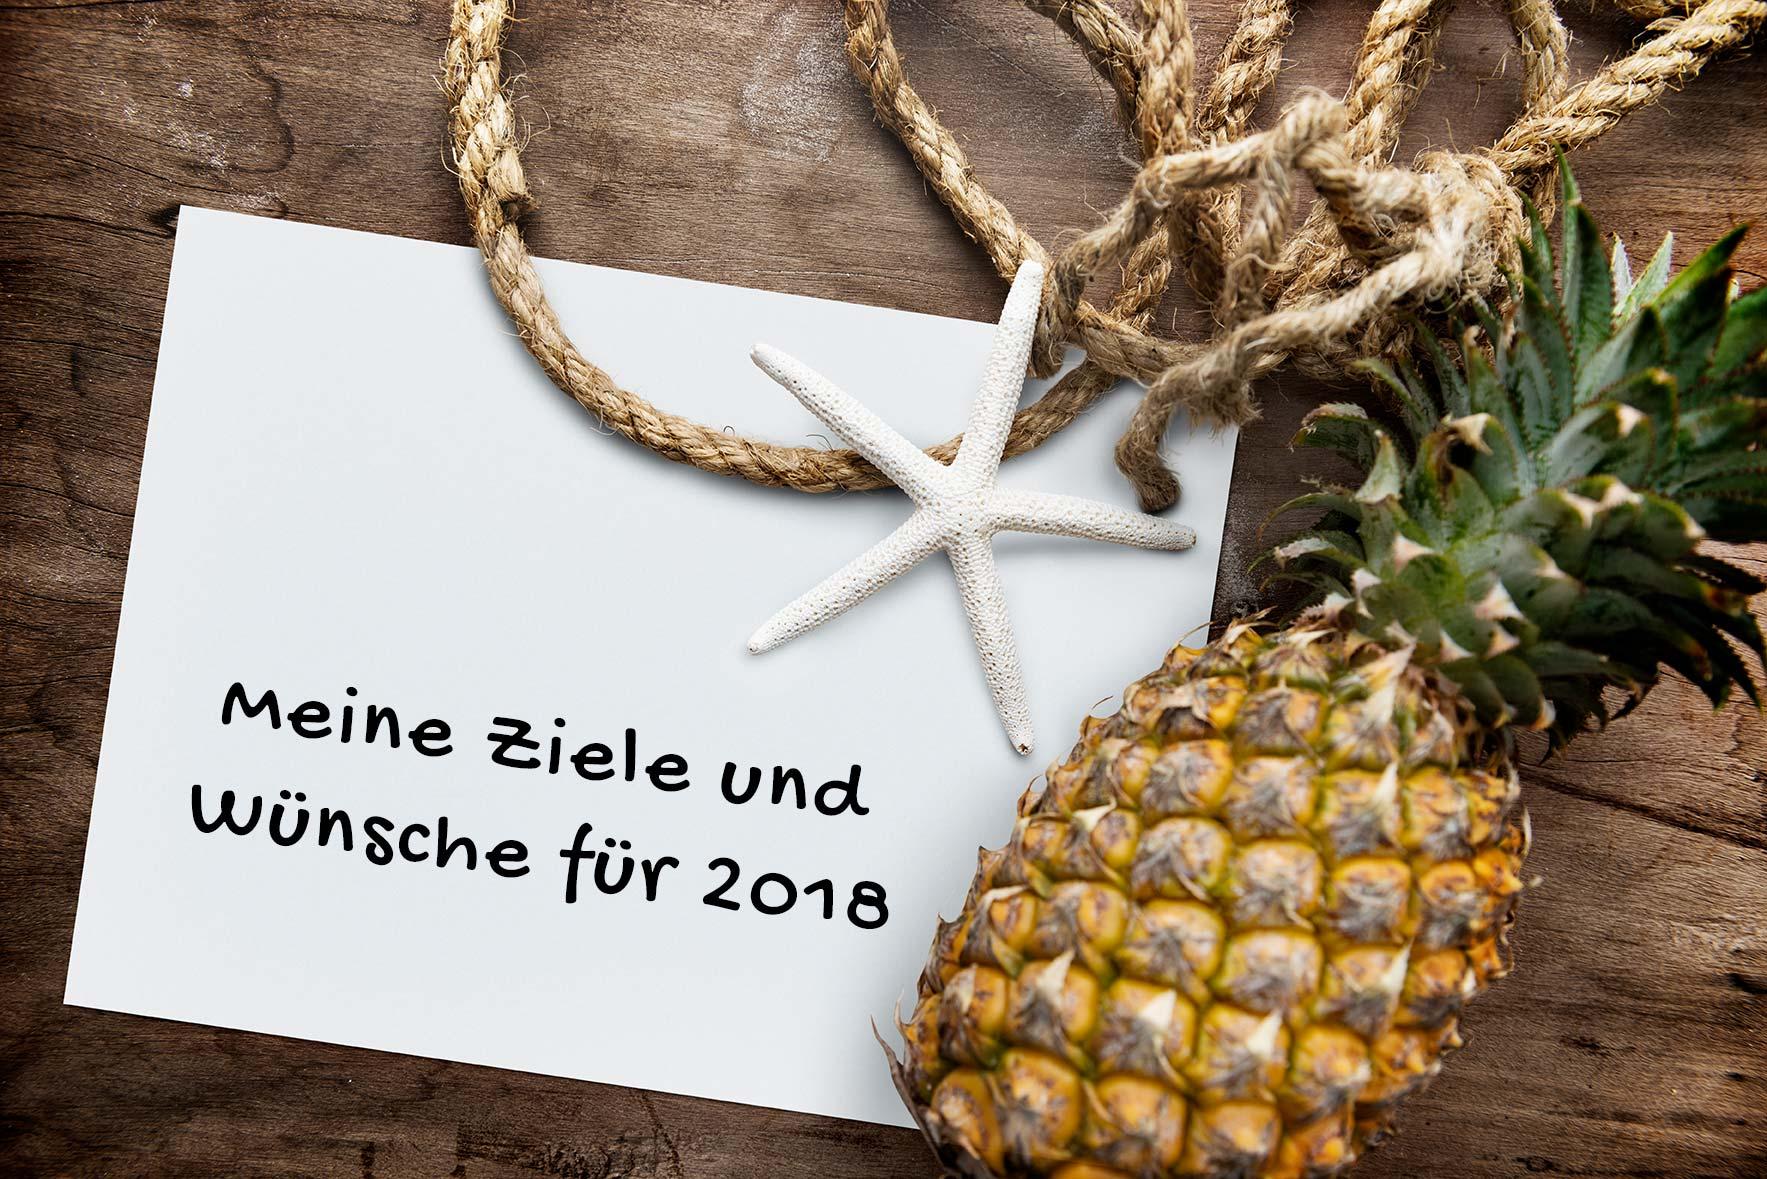 thetajunkies_meineZieleundWünsche2018